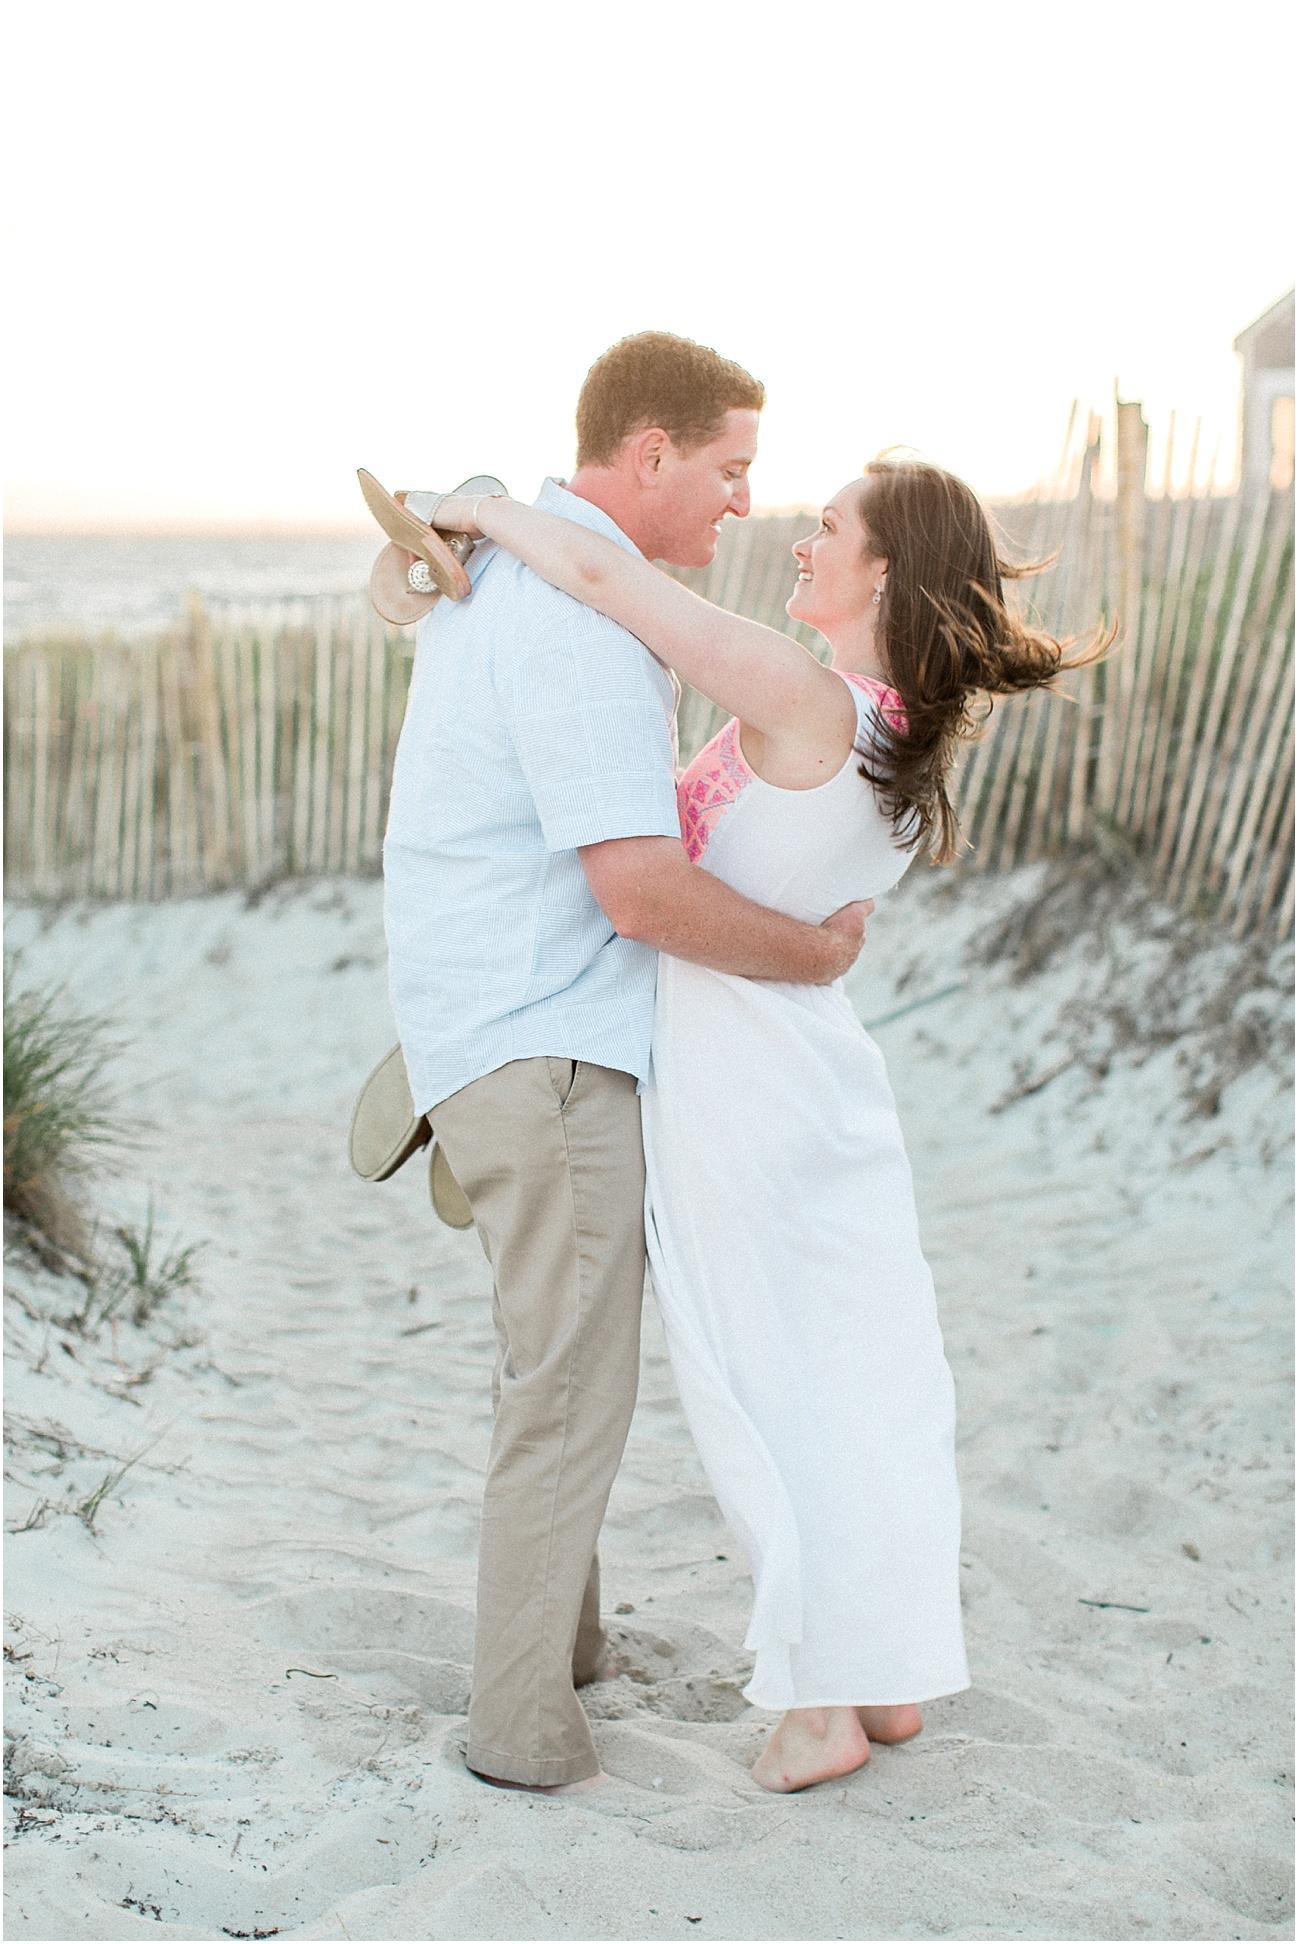 shannon_dan_engagement_session_sea_crest_beach_old_silver_chartroom_yacht_club_cape_cod_boston_wedding_photographer_meredith_jane_photography_photo_0339.jpg